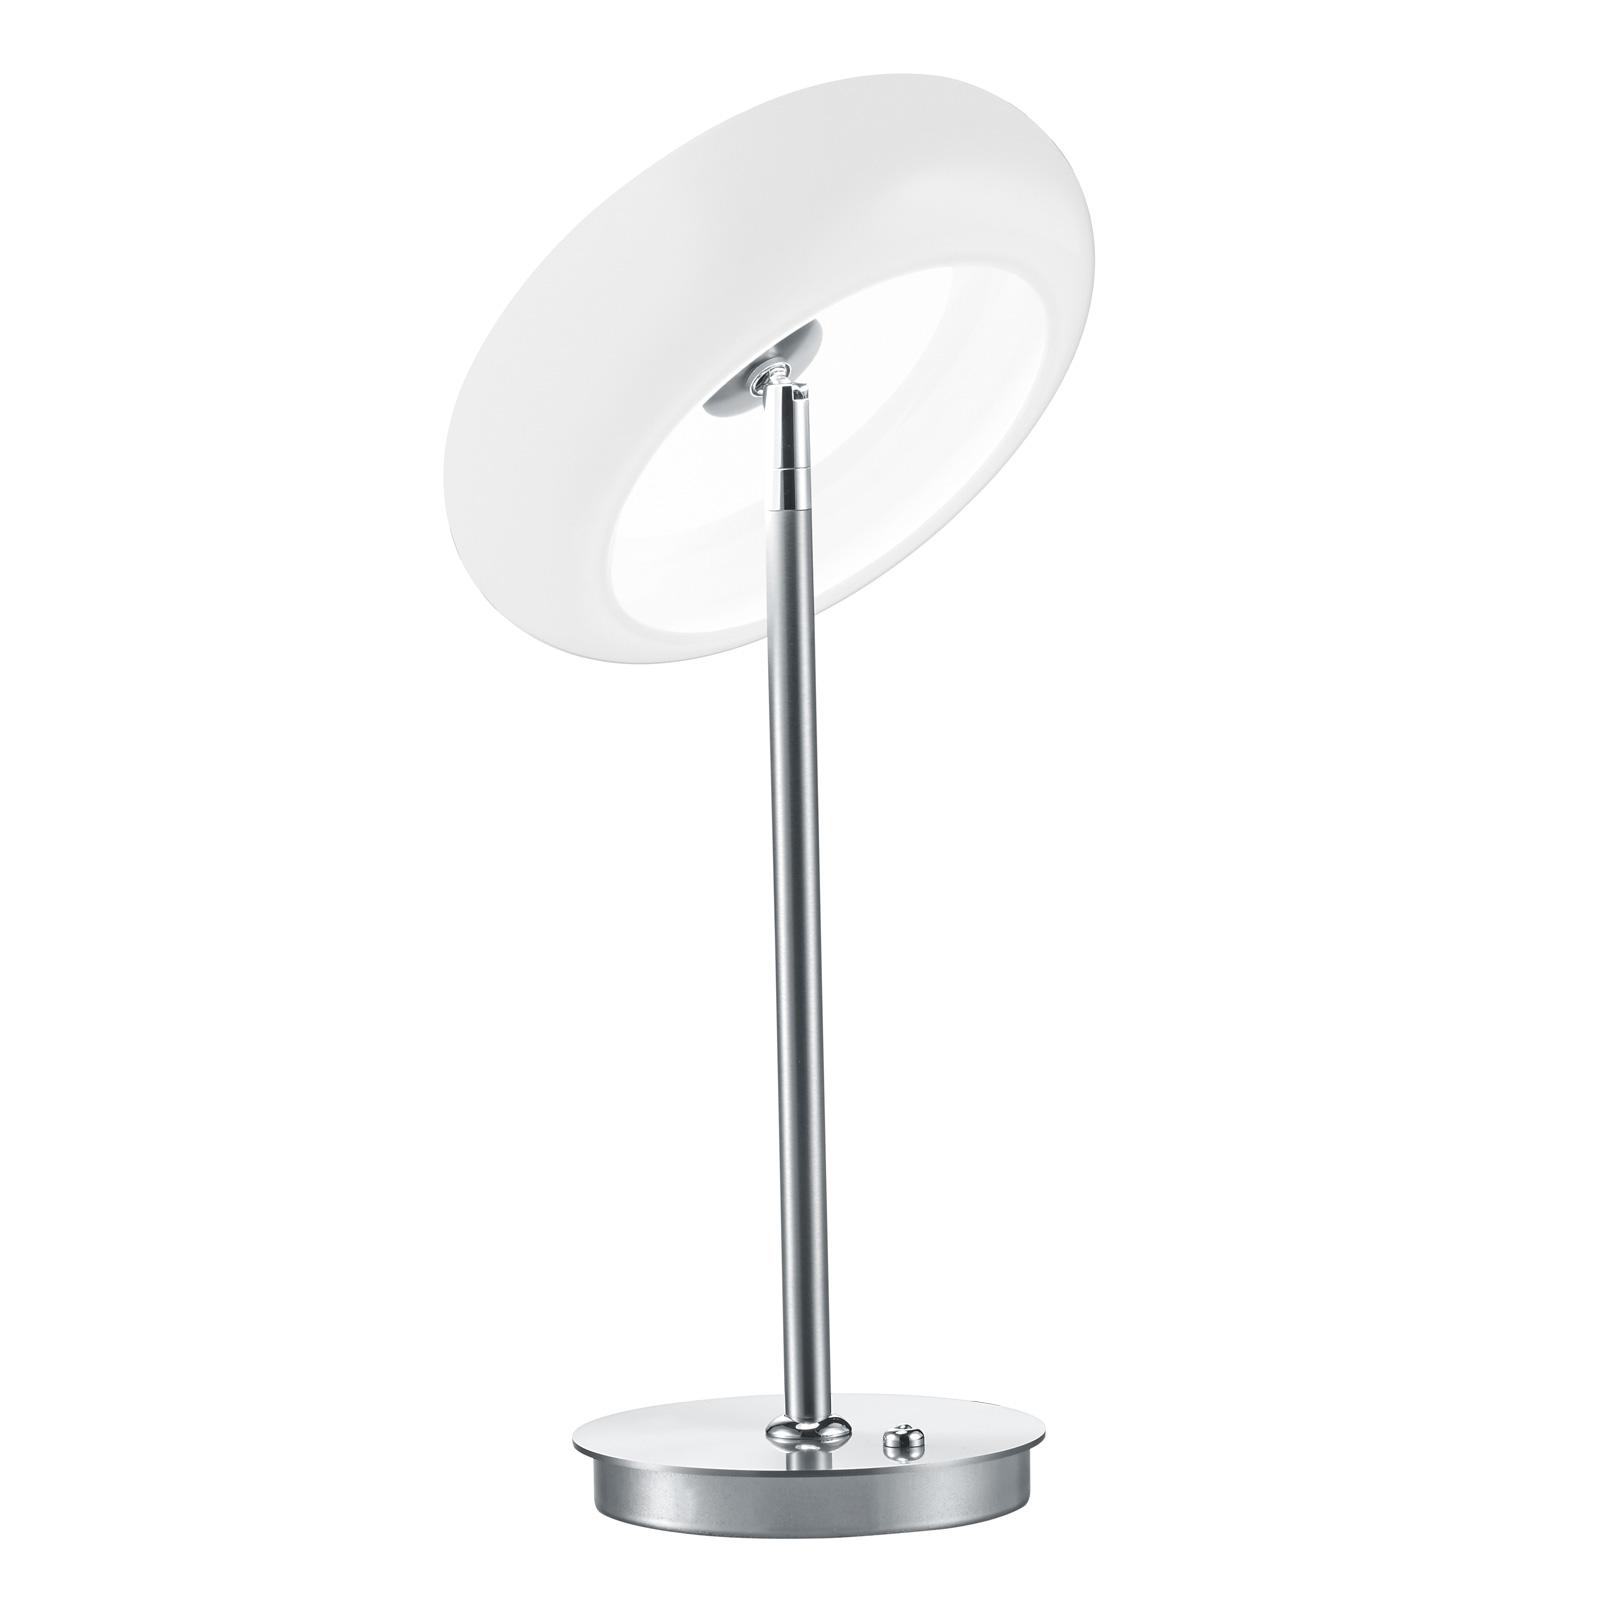 BANKAMP Centa LED tafellamp, nikkel